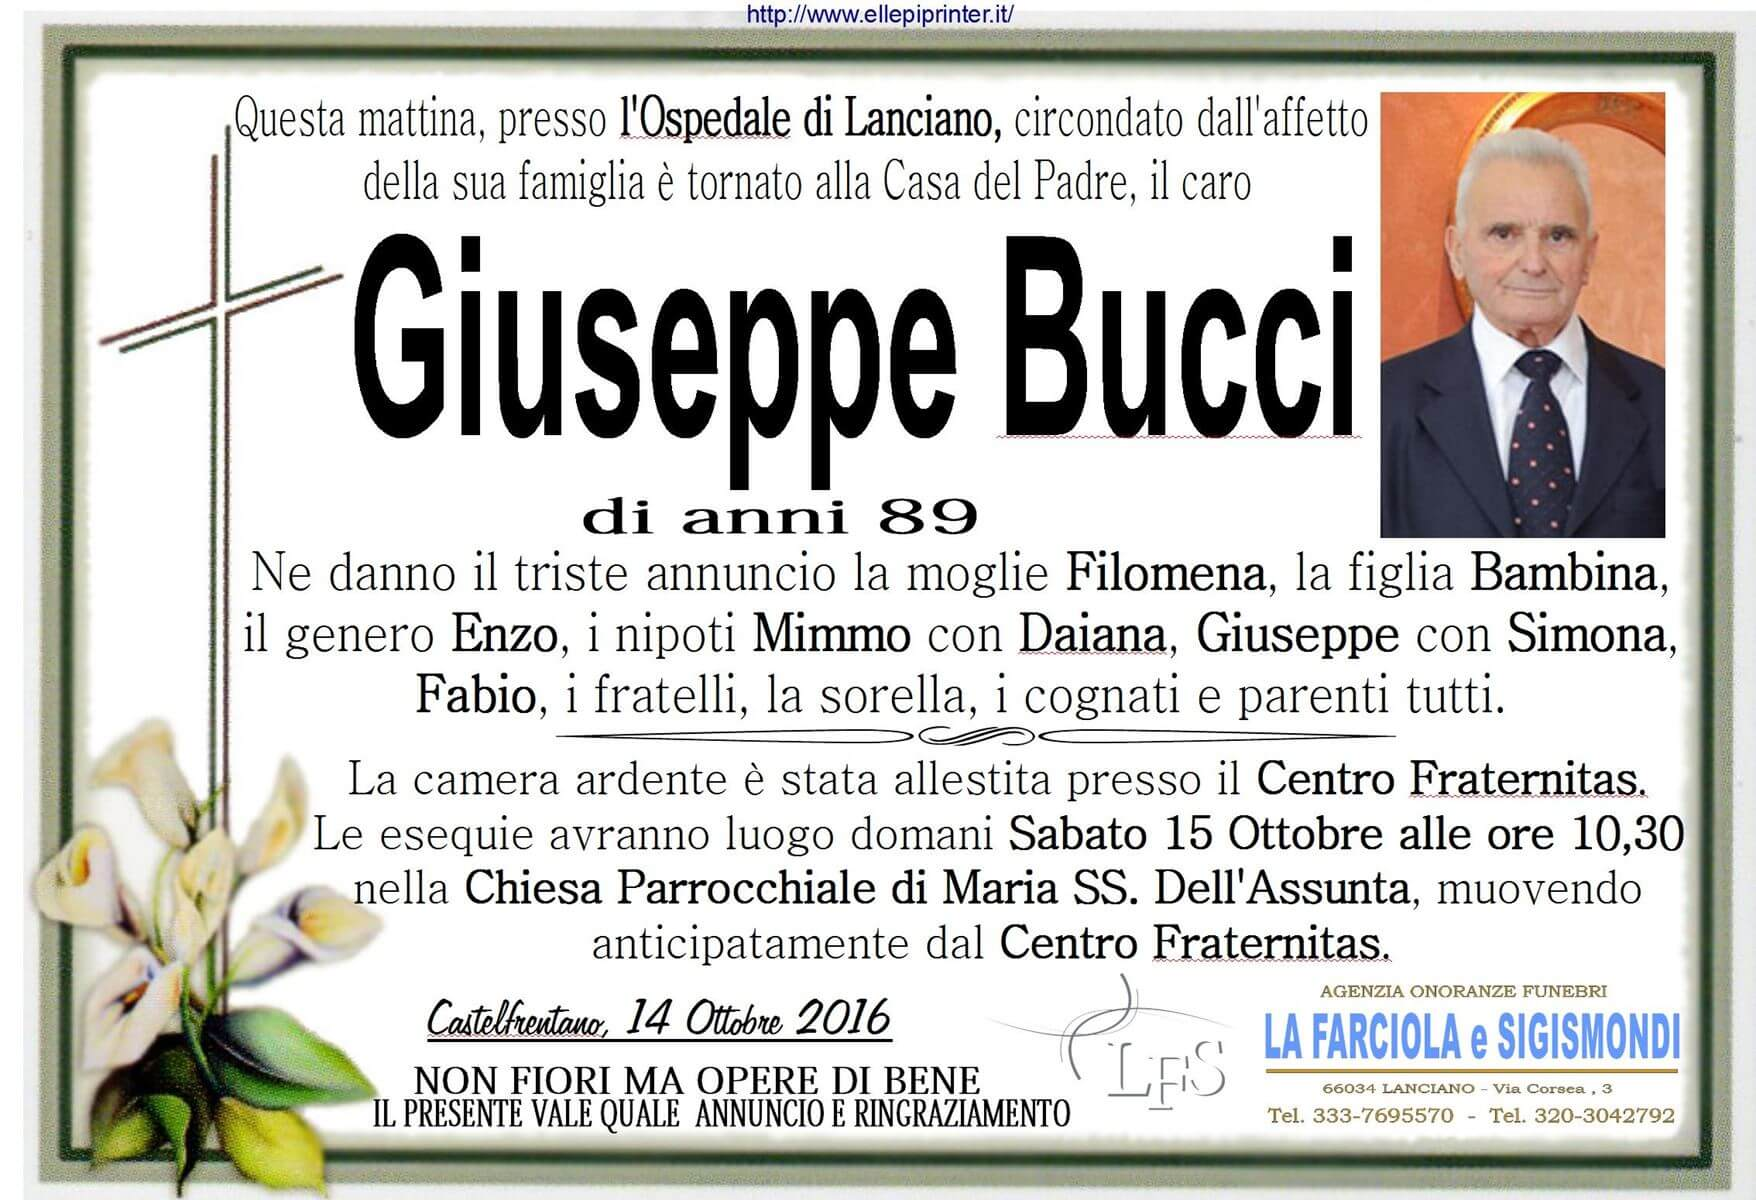 MANIFESTO BUCCI GIUSEPPE